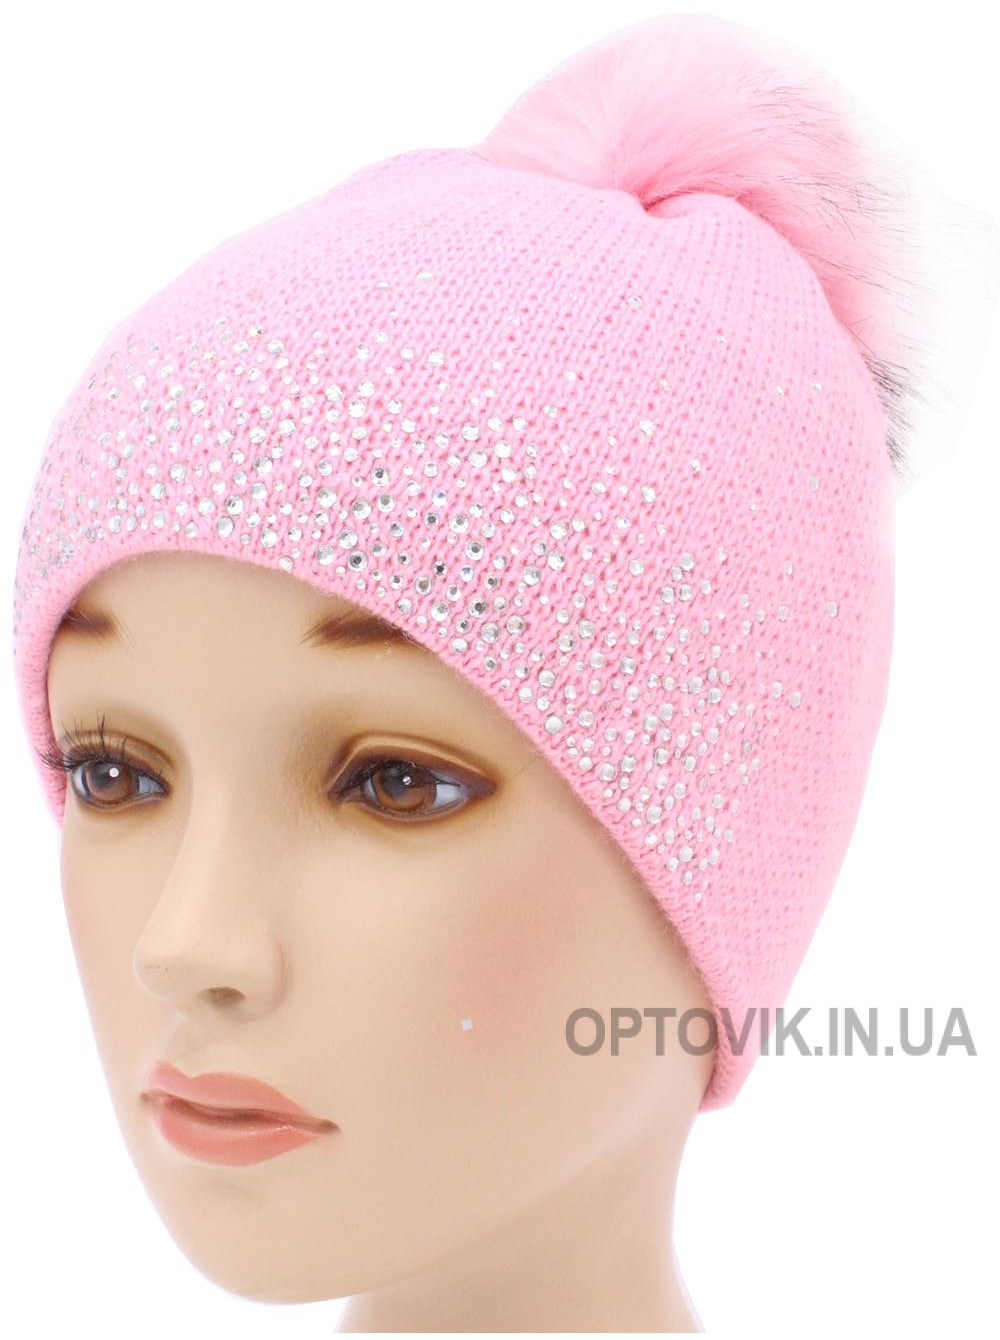 Детская вязаная шапка Кристалл D51232-48-52